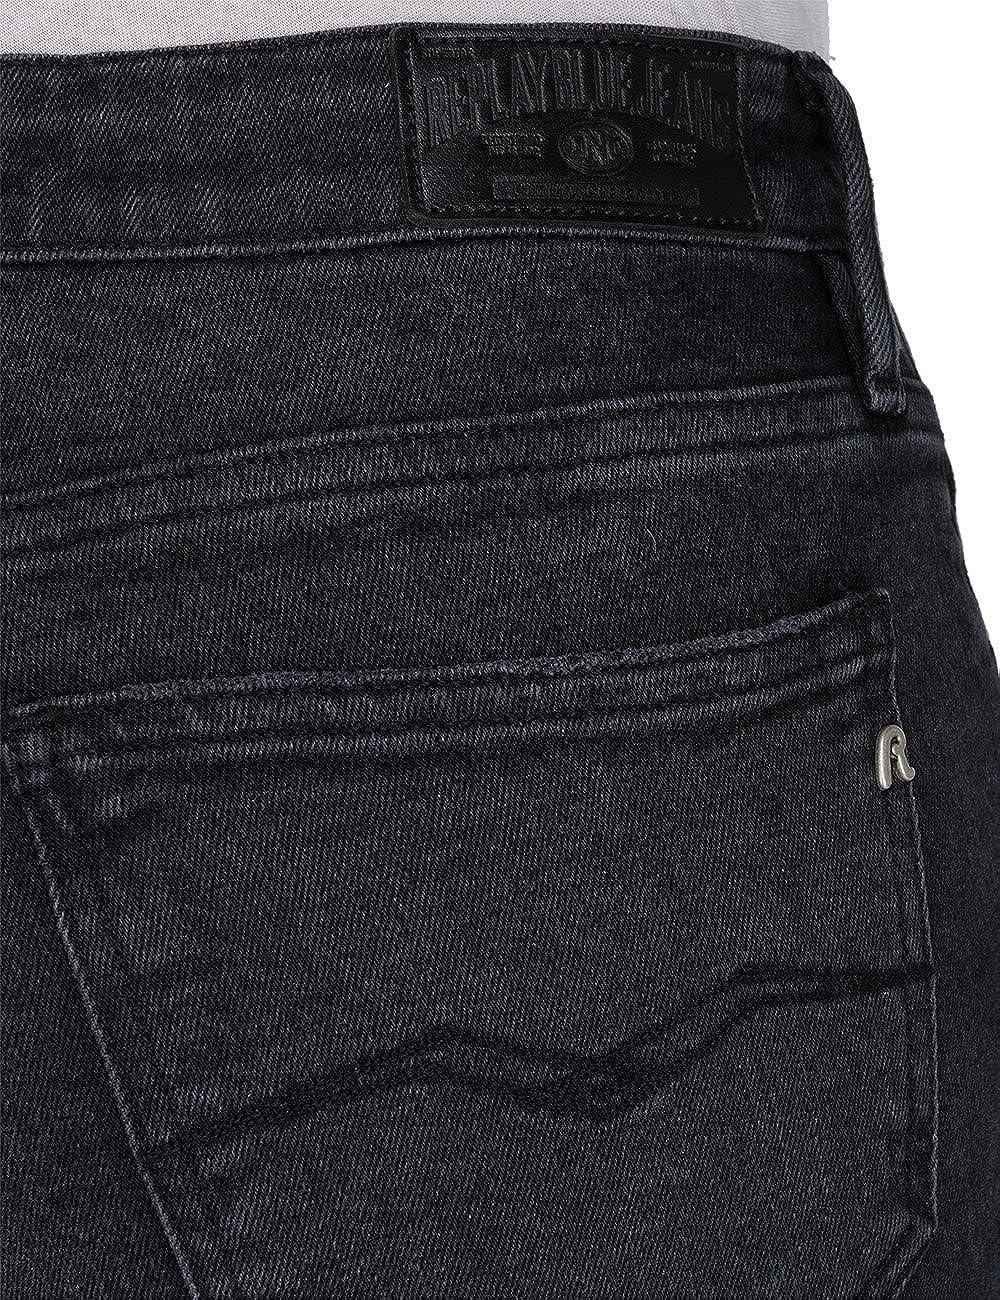 REPLAY Jacksy Jeans Donna